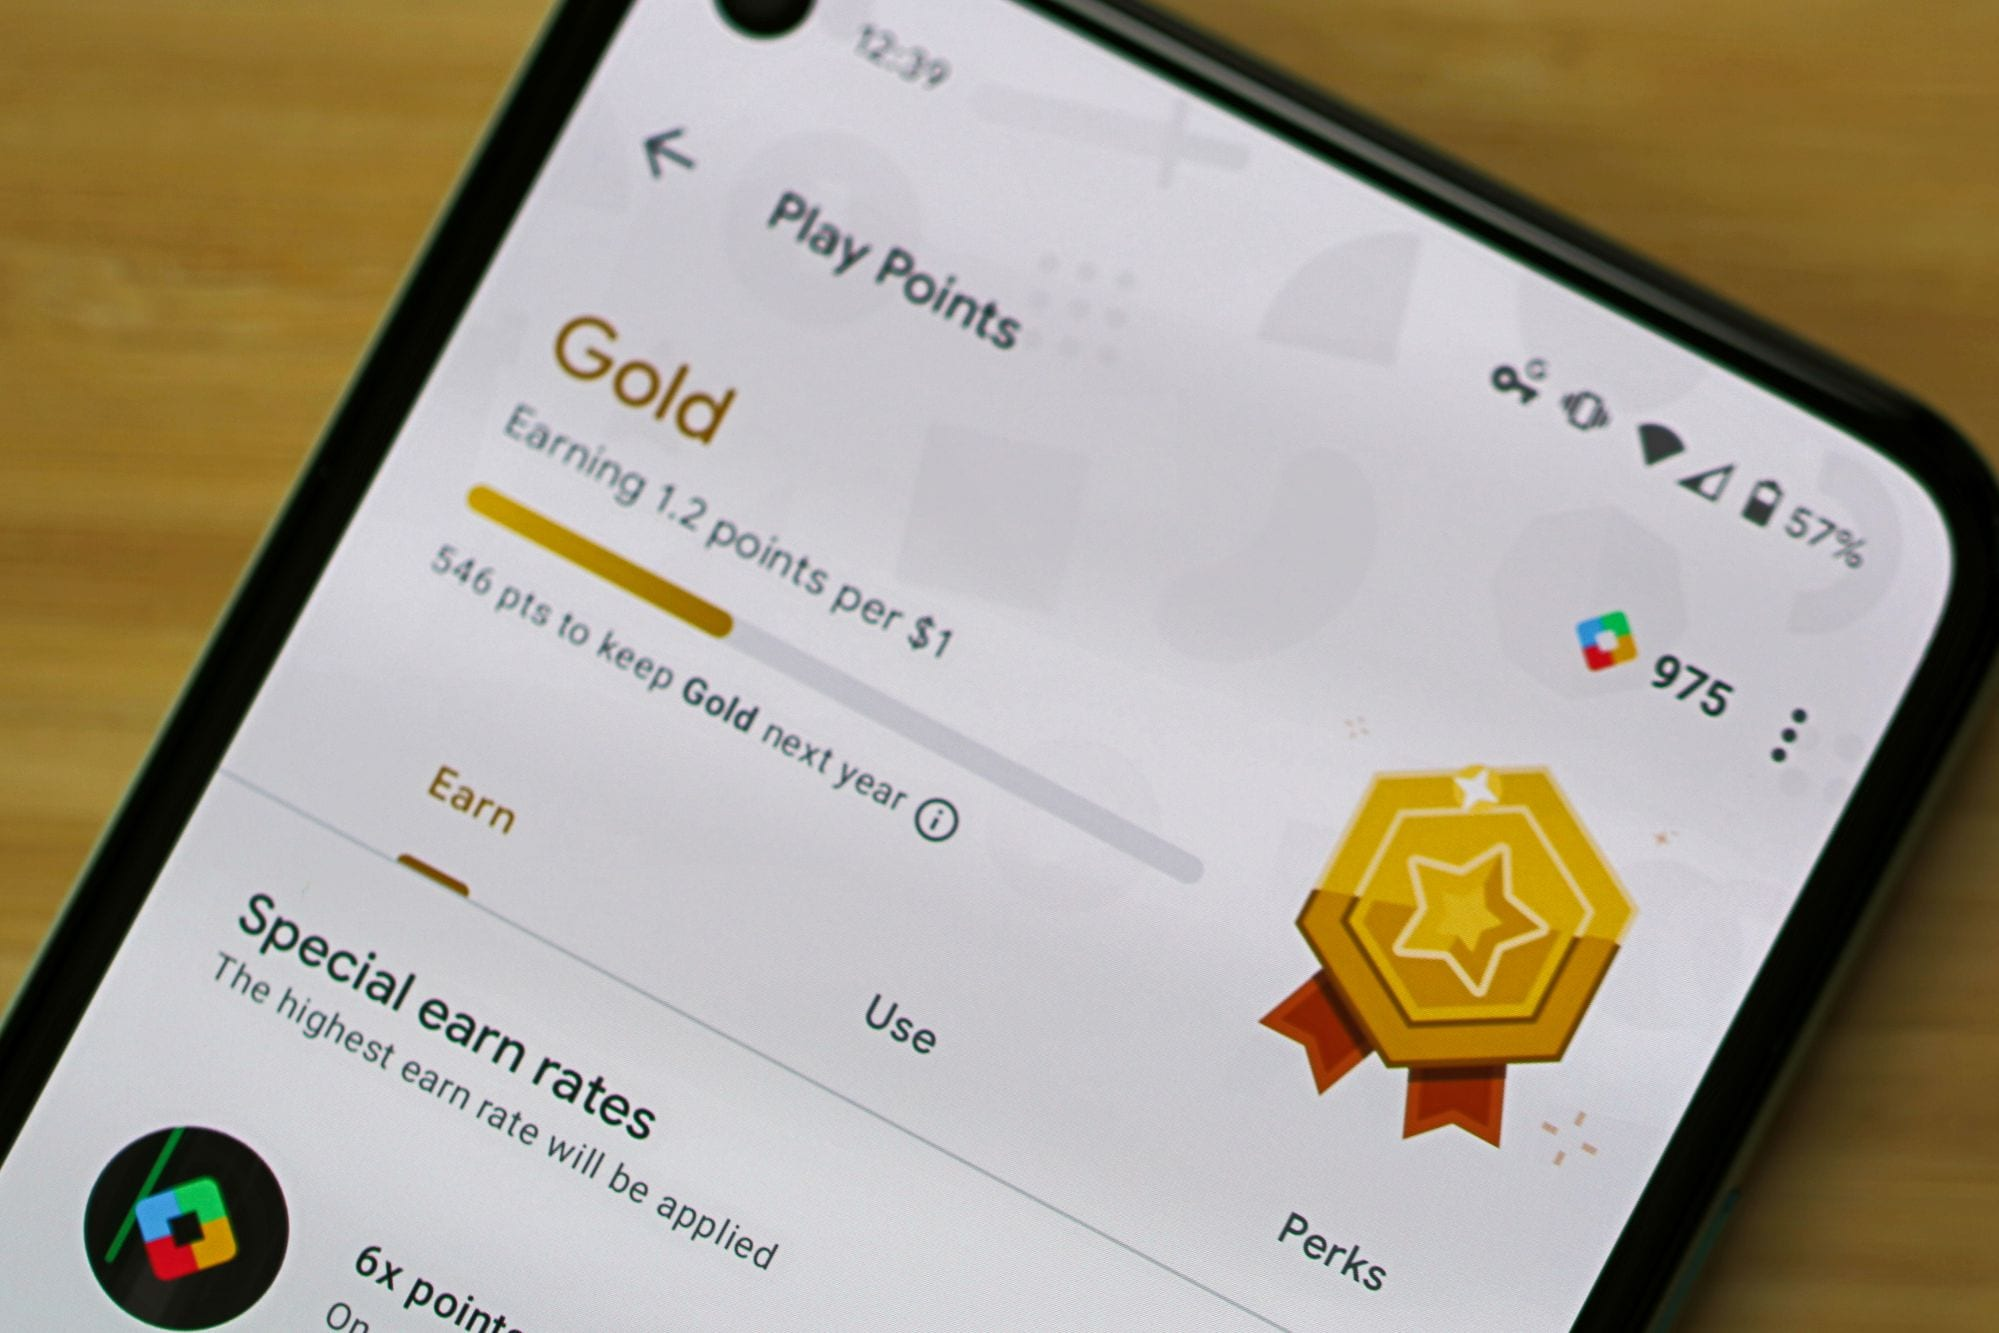 Cómo usar Google Play Points en Play Store